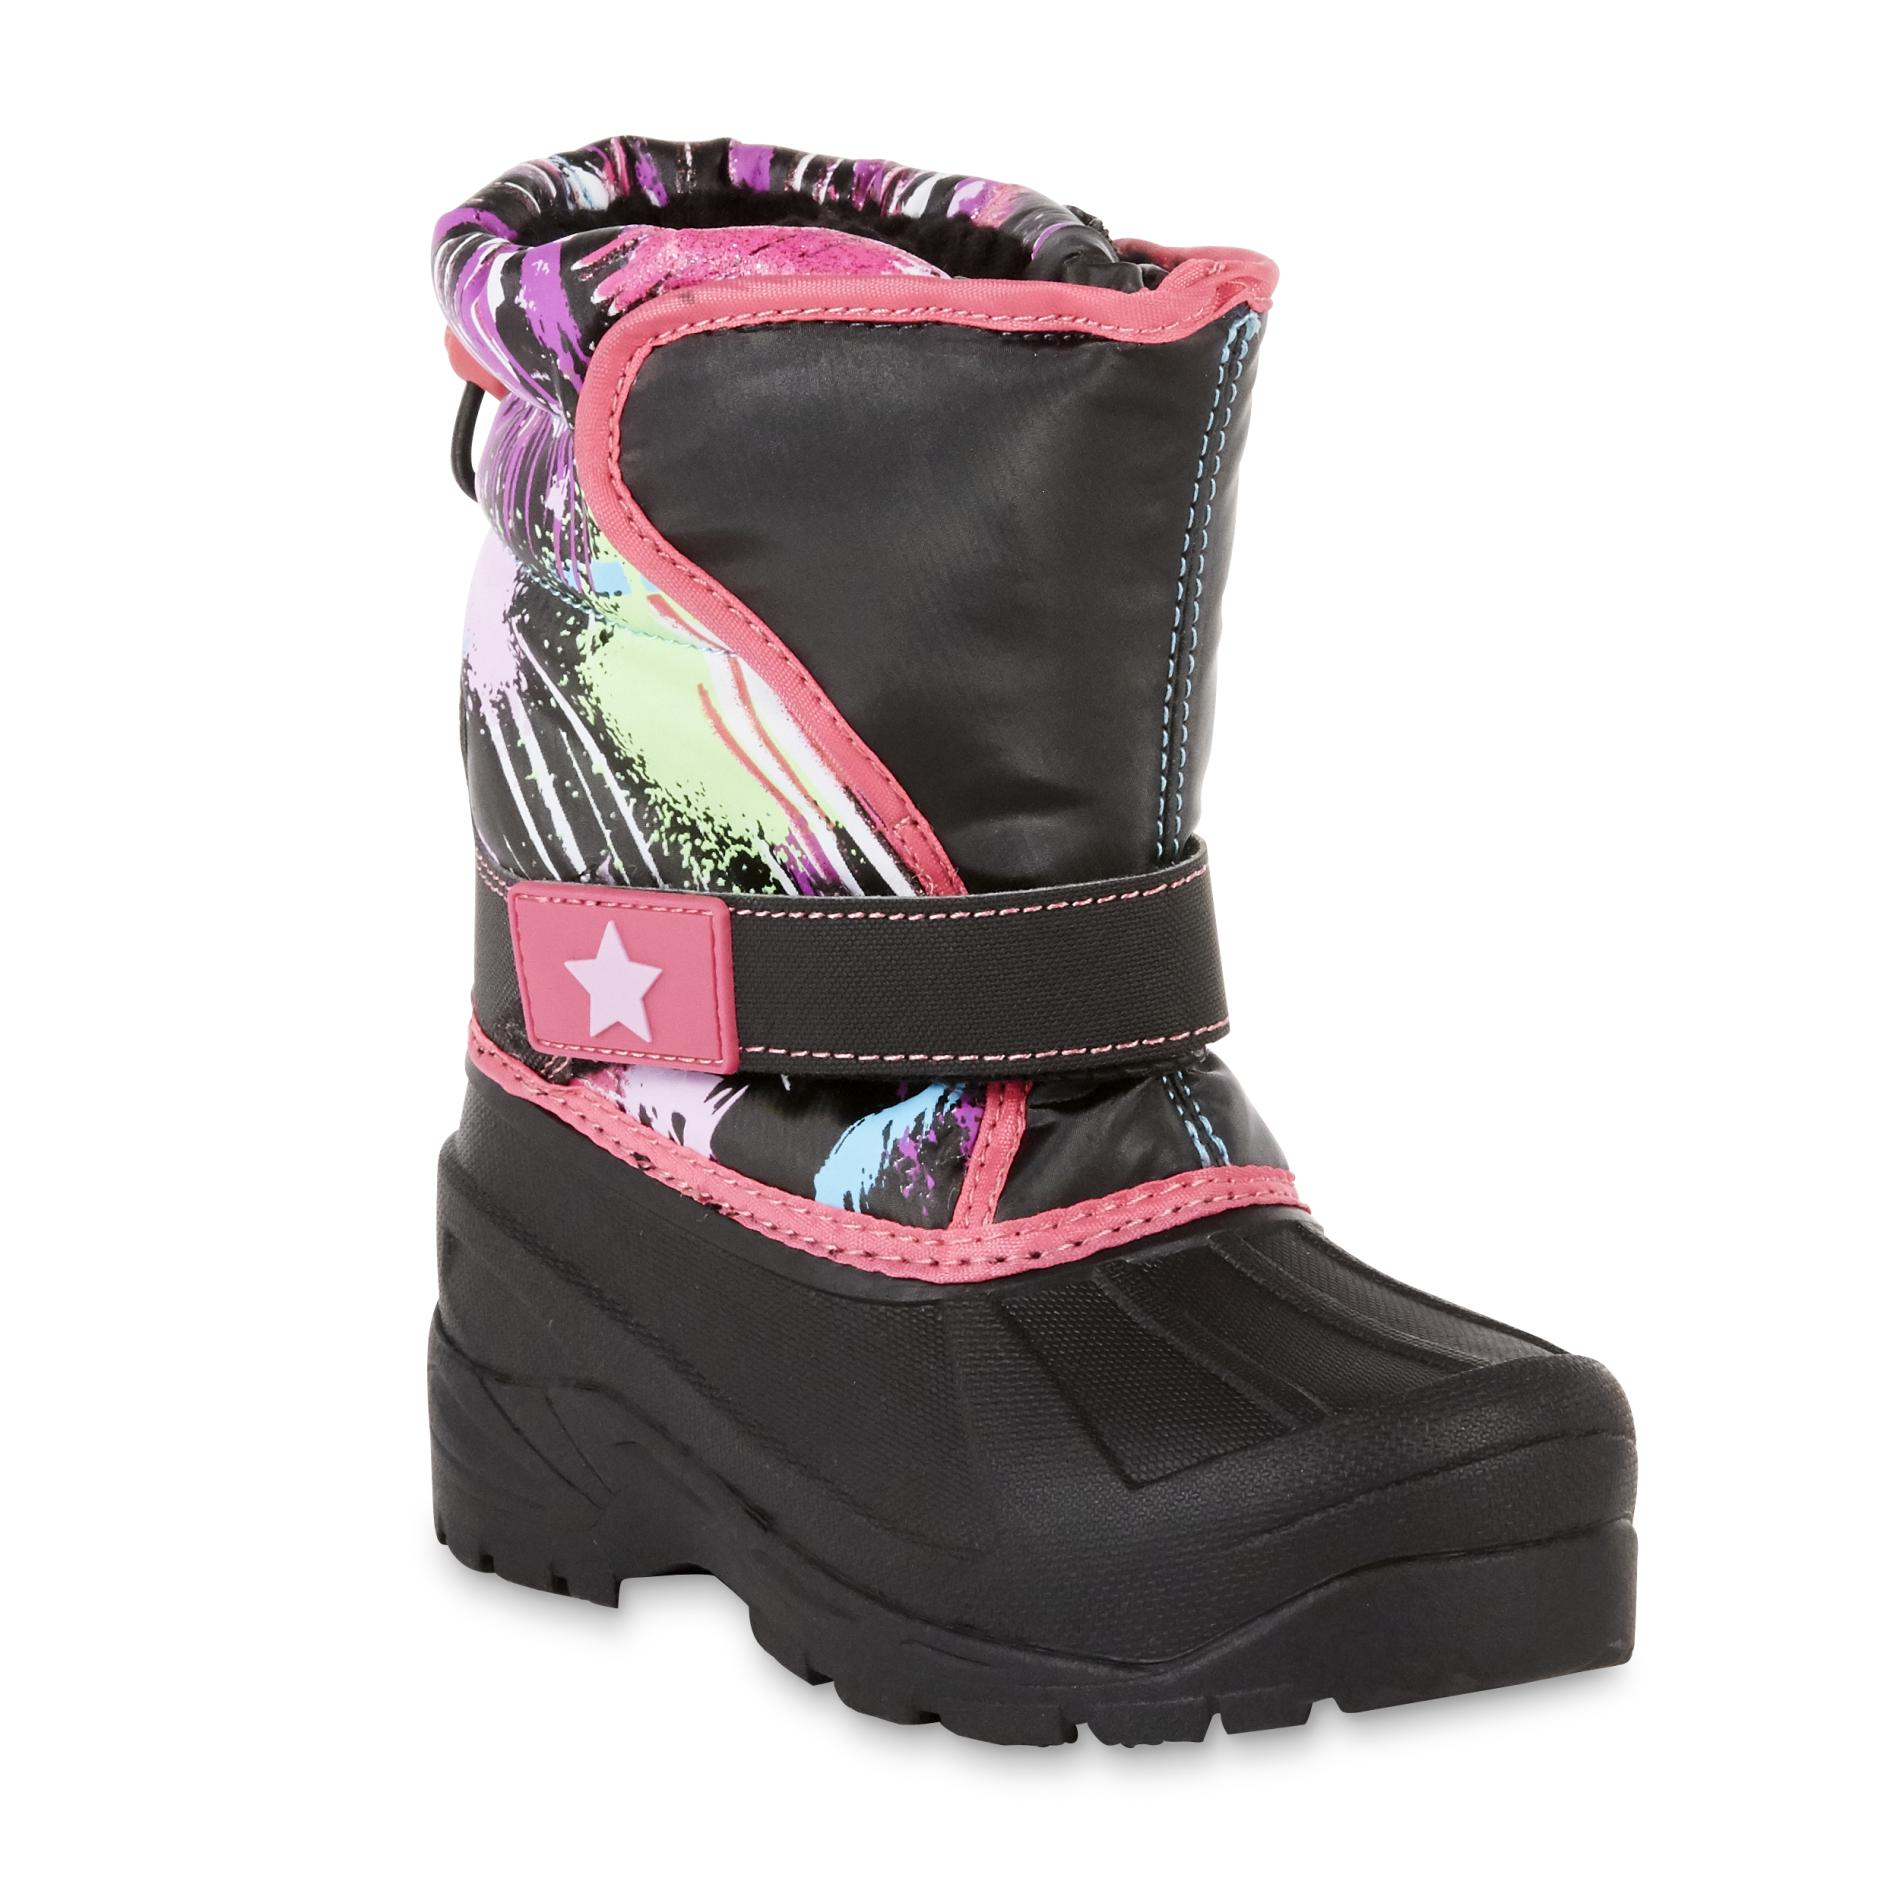 Athletech Girls39 Rue Waterproof Winter Boot Shop Your